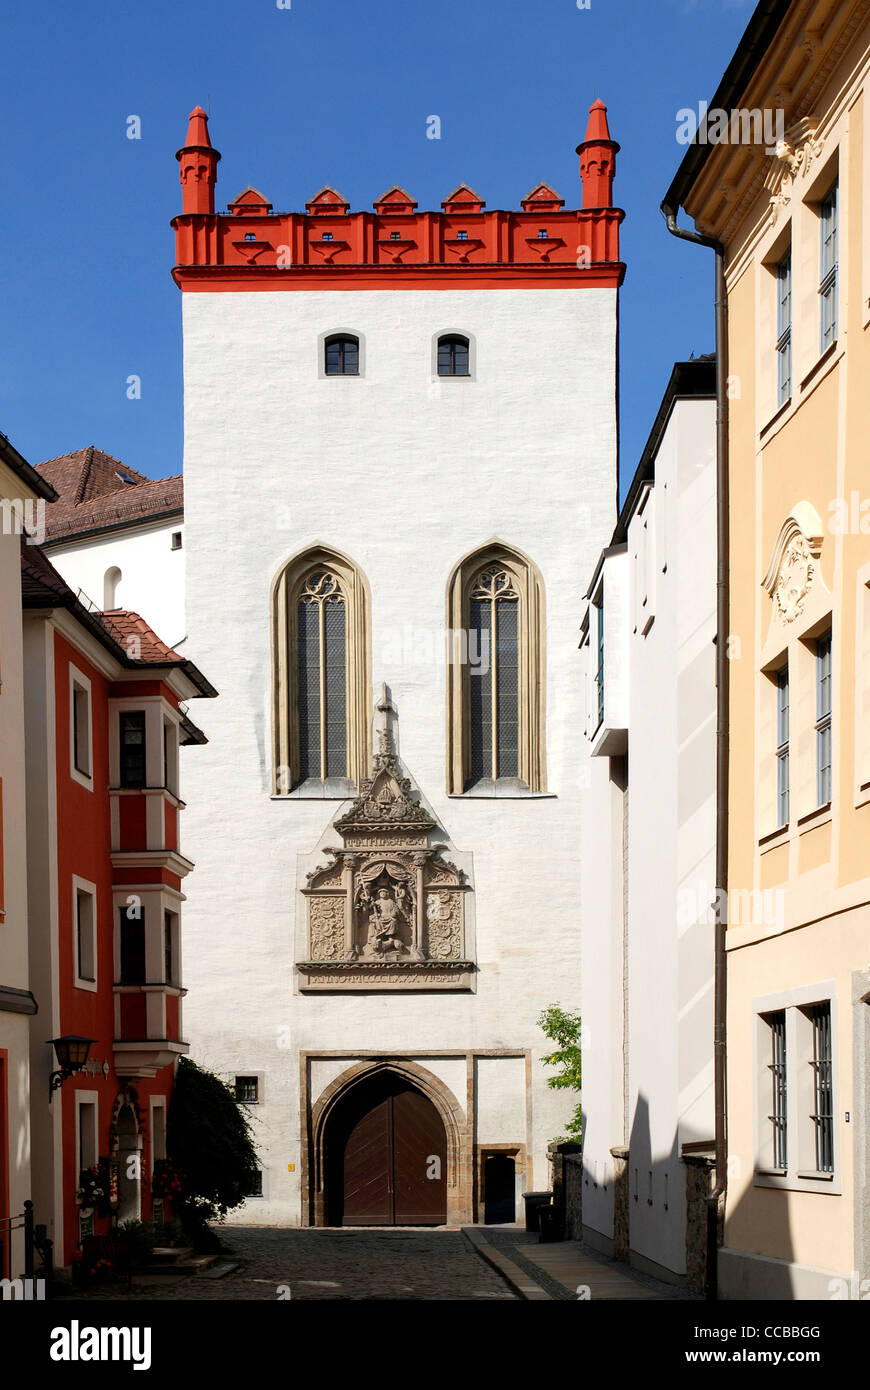 Tower Matthiasturm is the main entrance to castle Ortenburg in Bautzen. - Stock Image